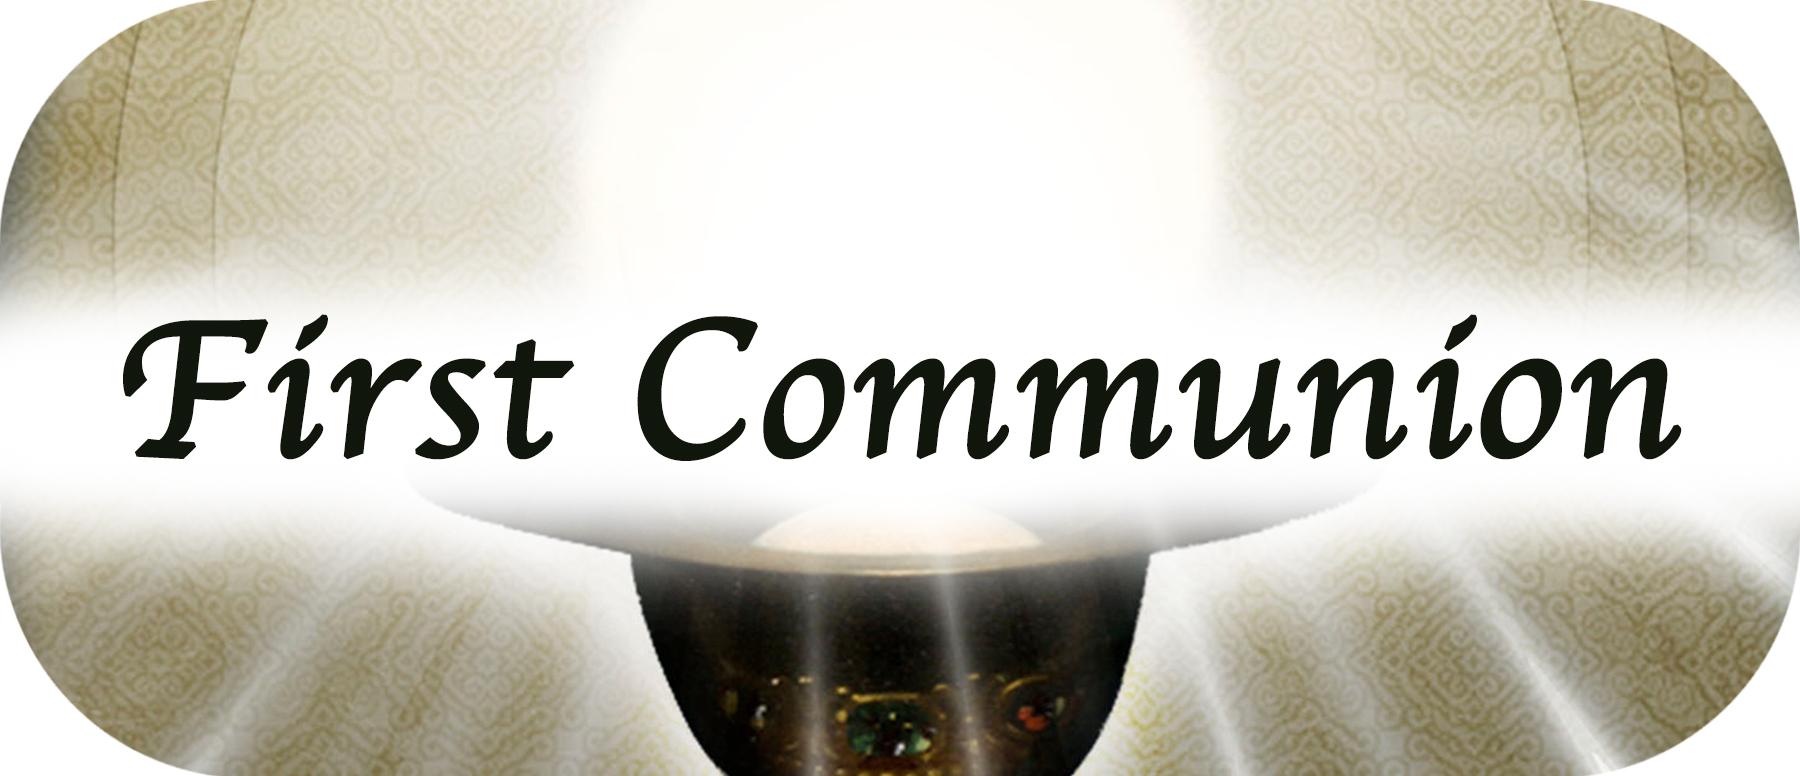 first-communion-button.jpg